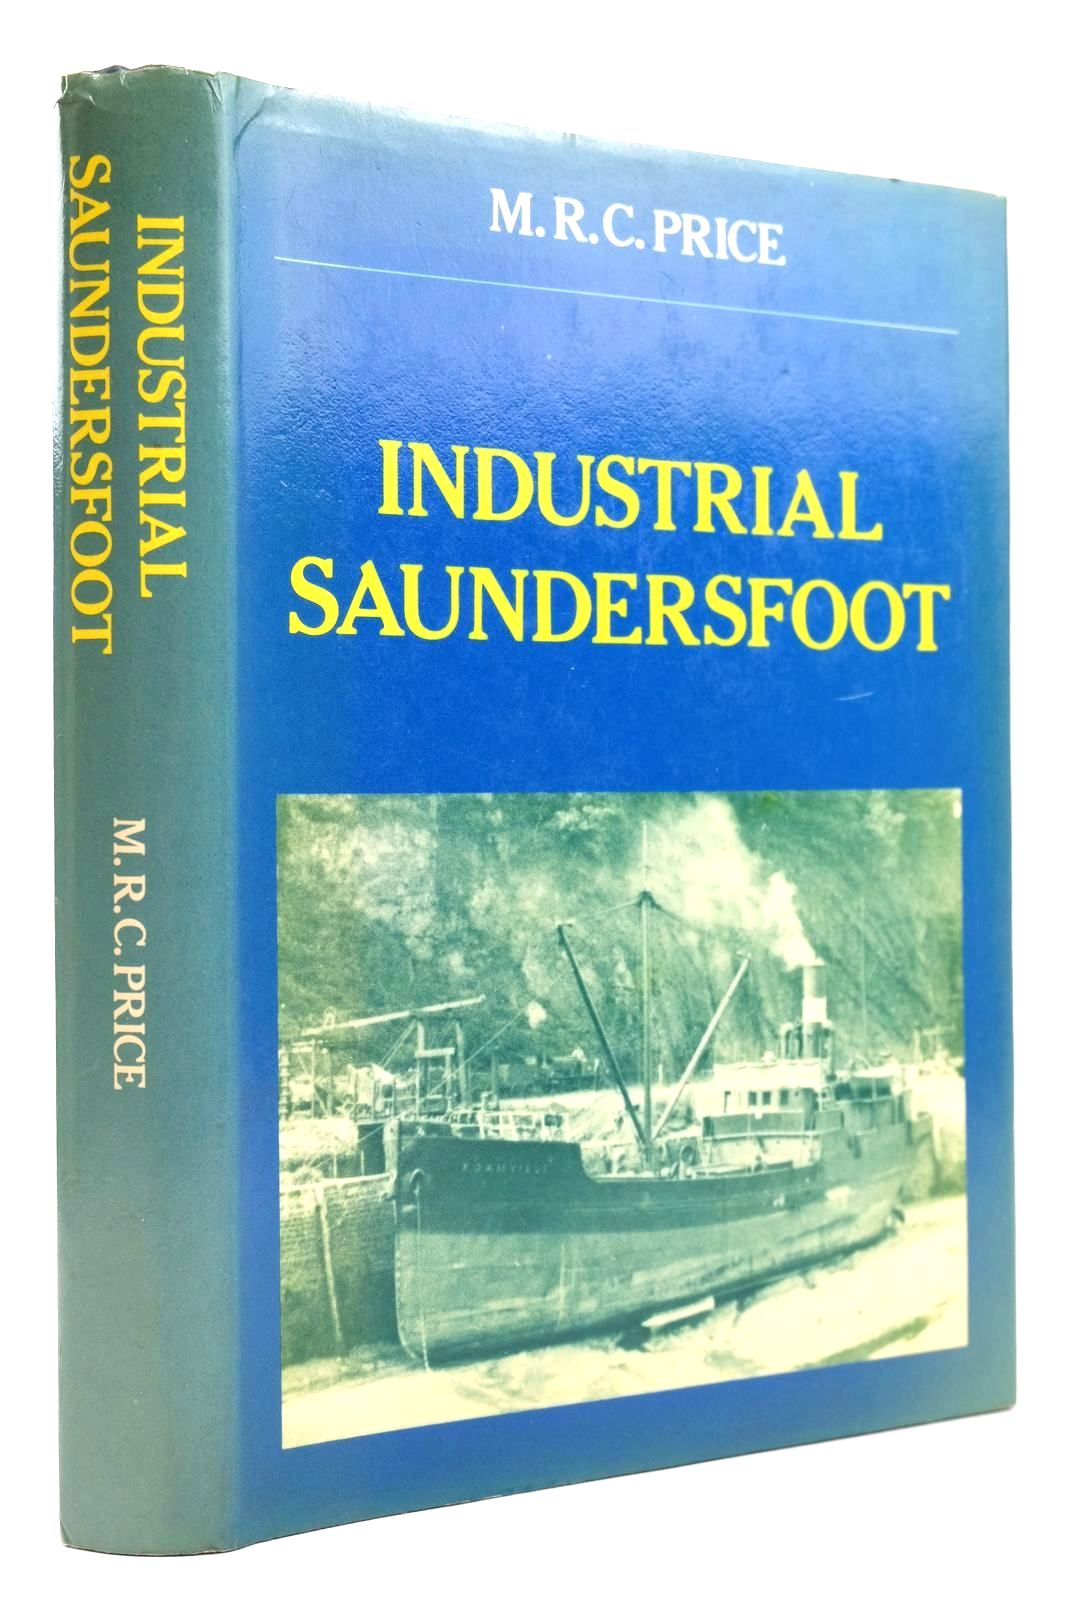 Photo of INDUSTRIAL SAUNDERSFOOT- Stock Number: 2132504